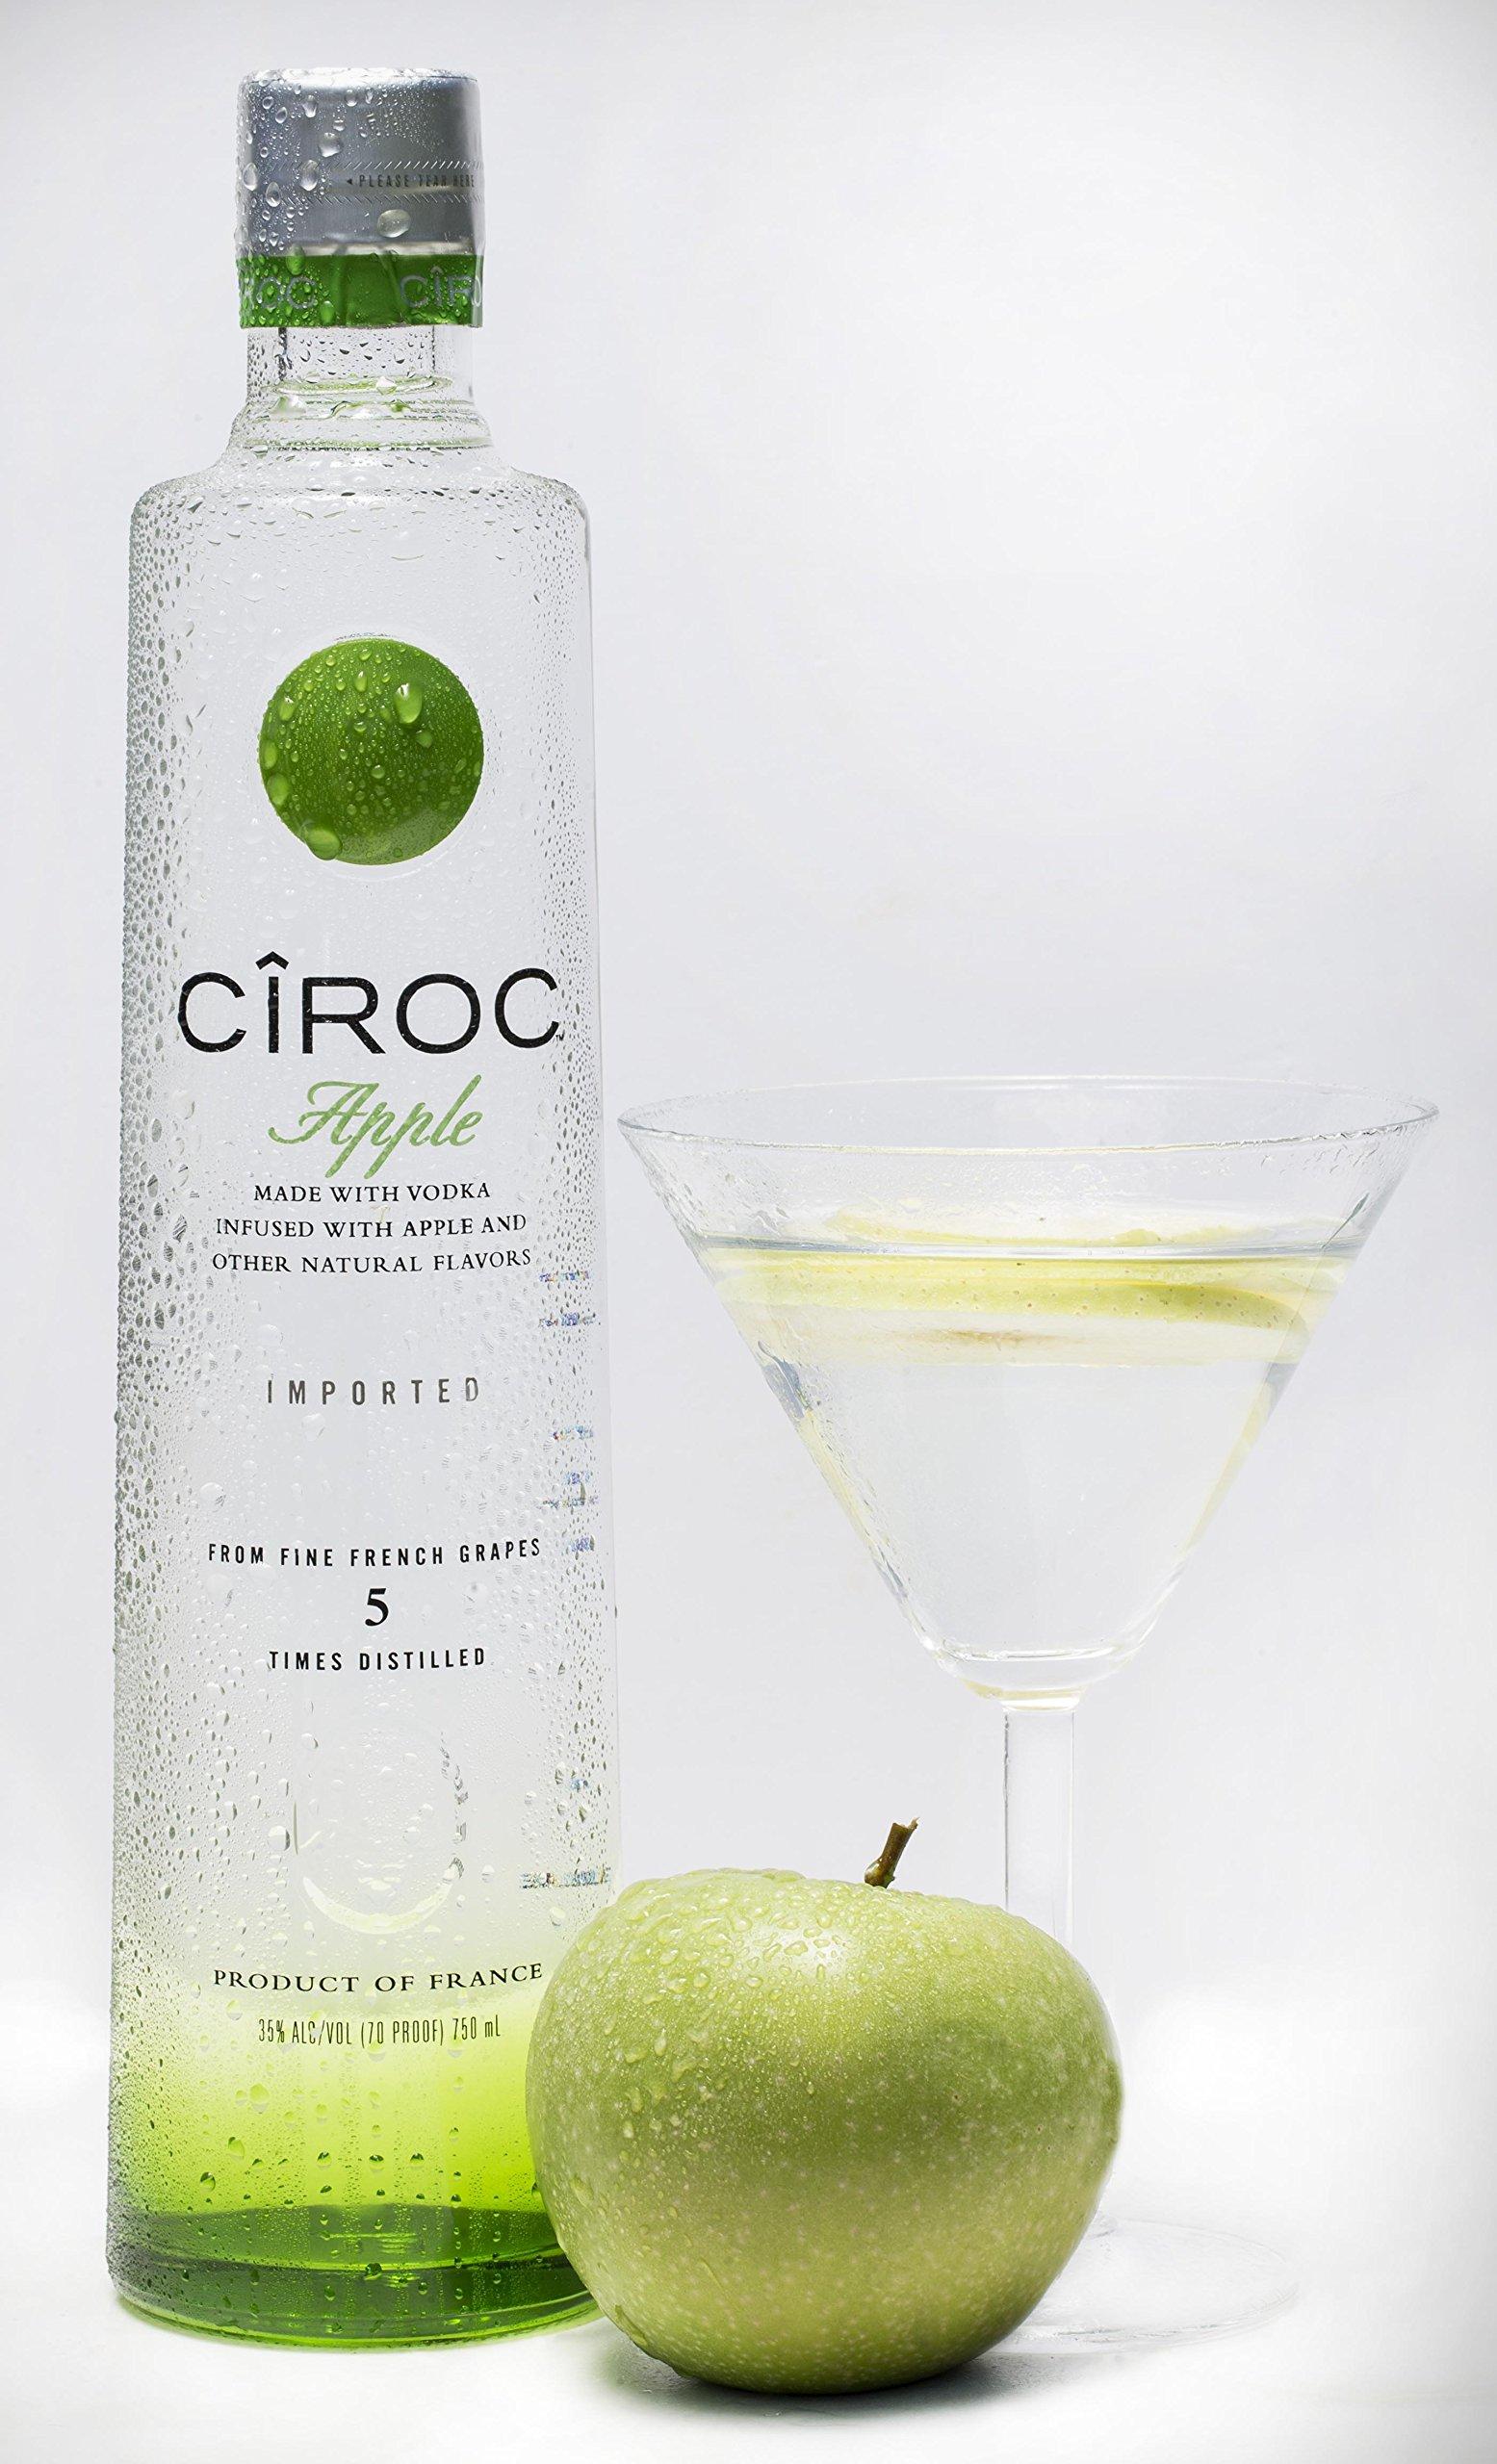 Ciroc-Apple-Infused-Vodka-375-07l-Flasche